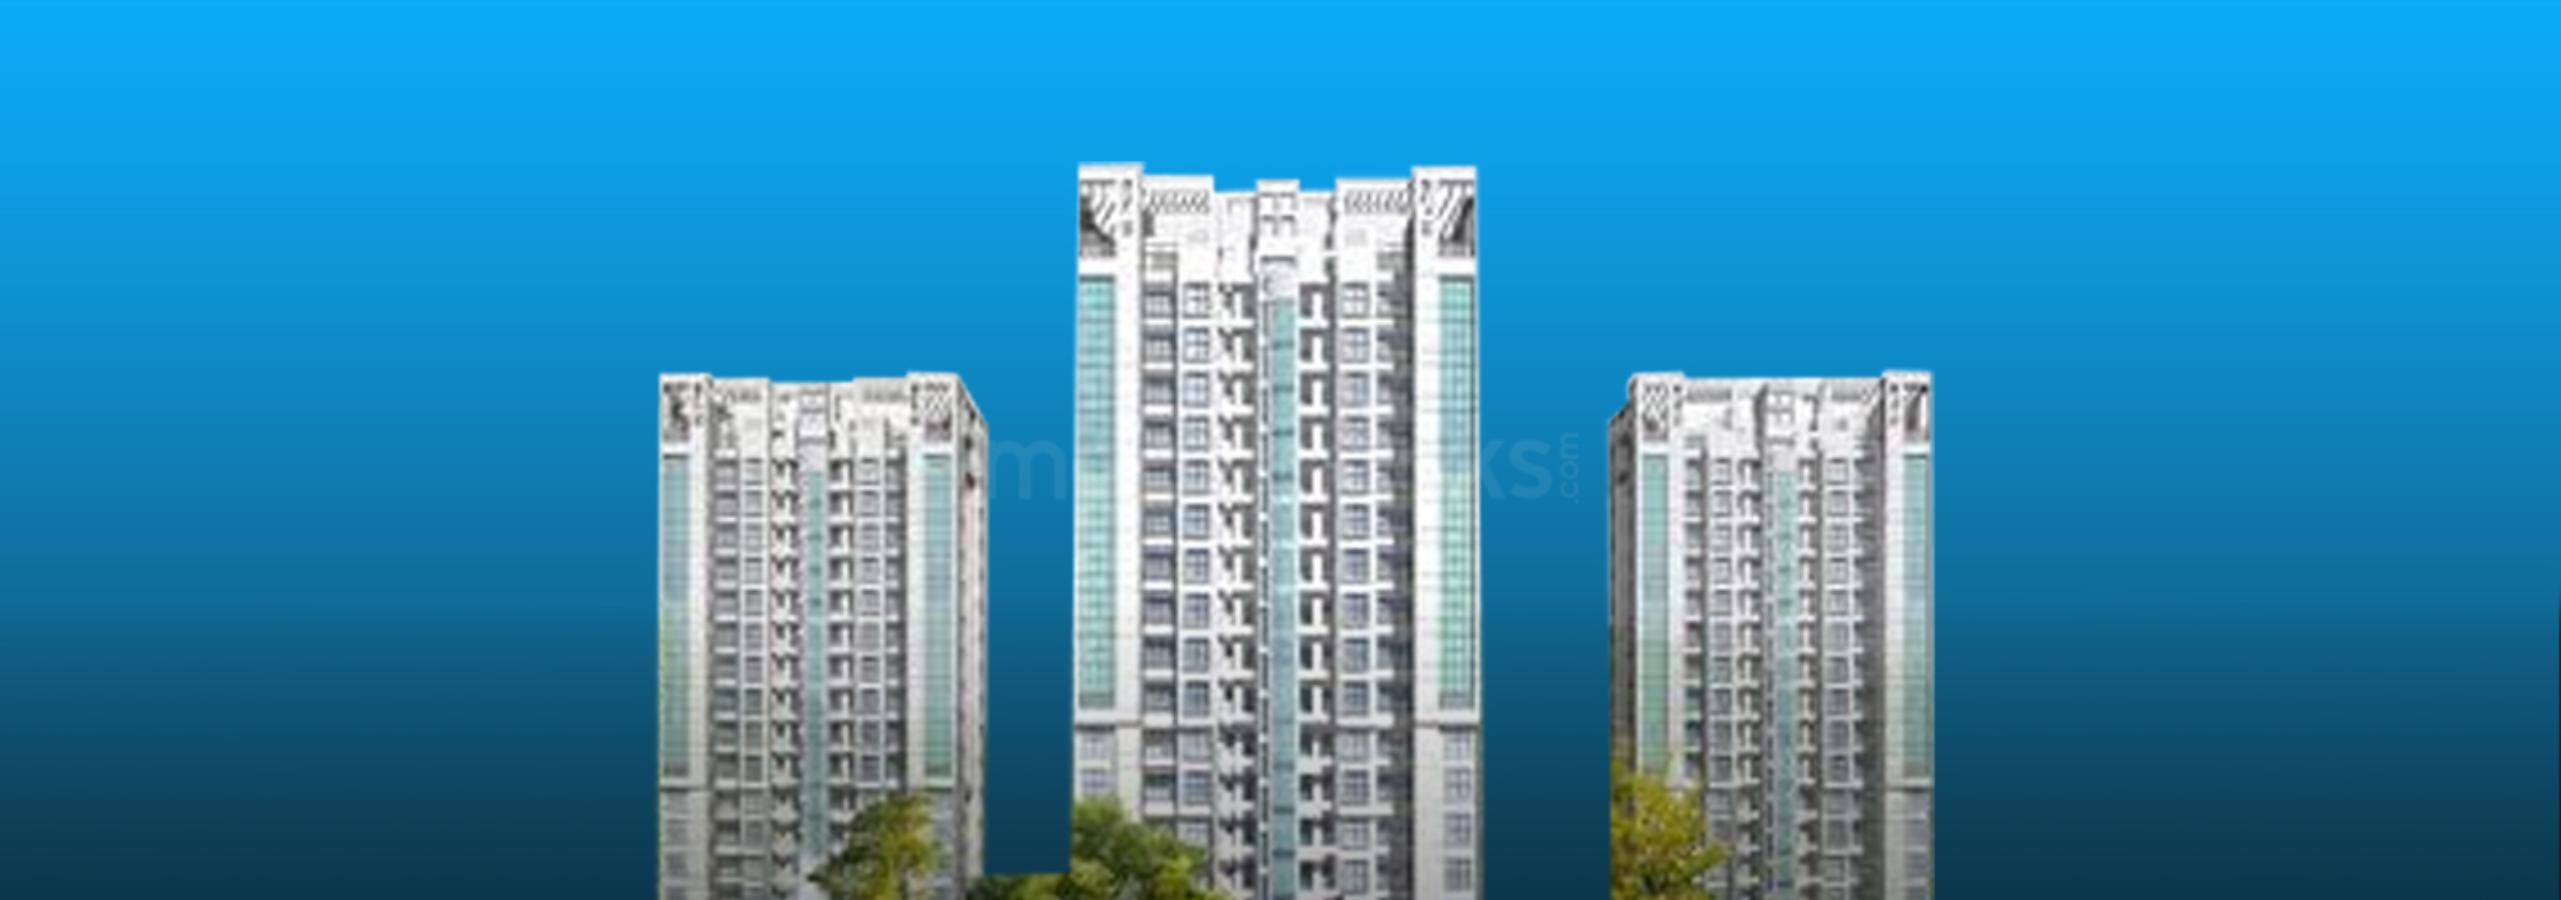 Id20 as well Sureka Group Sunrise Greens Rajarhat Kolkata Pdpid 4d4235303030313633 further Sunrise Greens Ghuni Rajarhat 3646 543 moreover 3bhk 2t 1575 Sqft Apartment besides Recreation Center Floor Plan. on sunrise greens kolkata